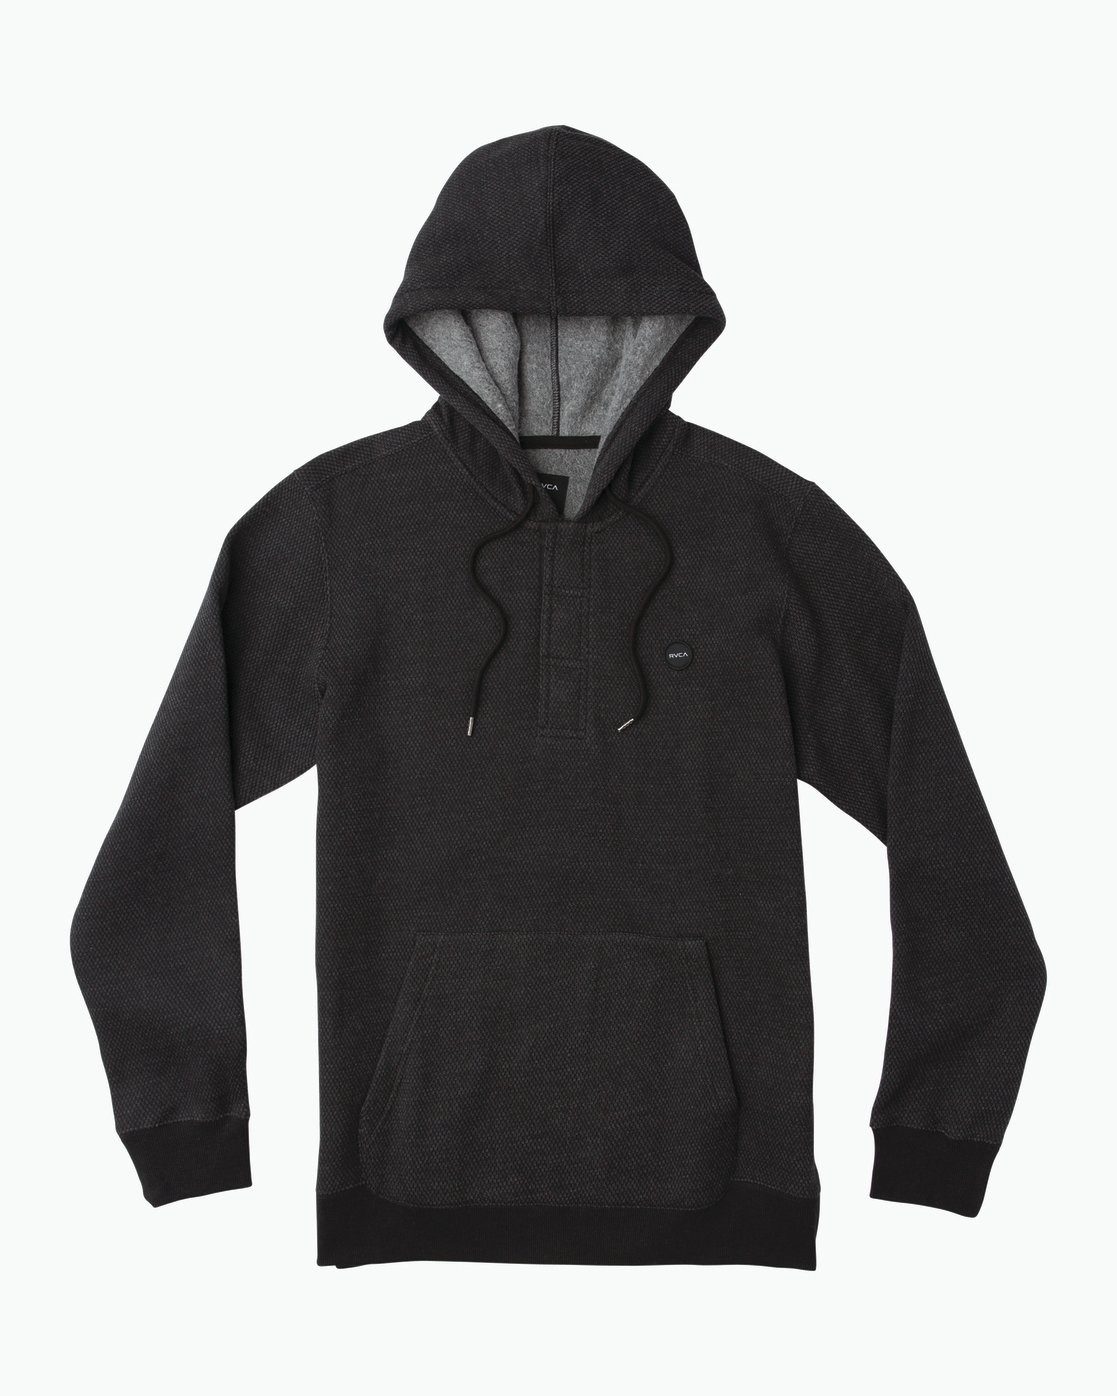 0 Lupo Fleece Hoodie Black M601QRLP RVCA